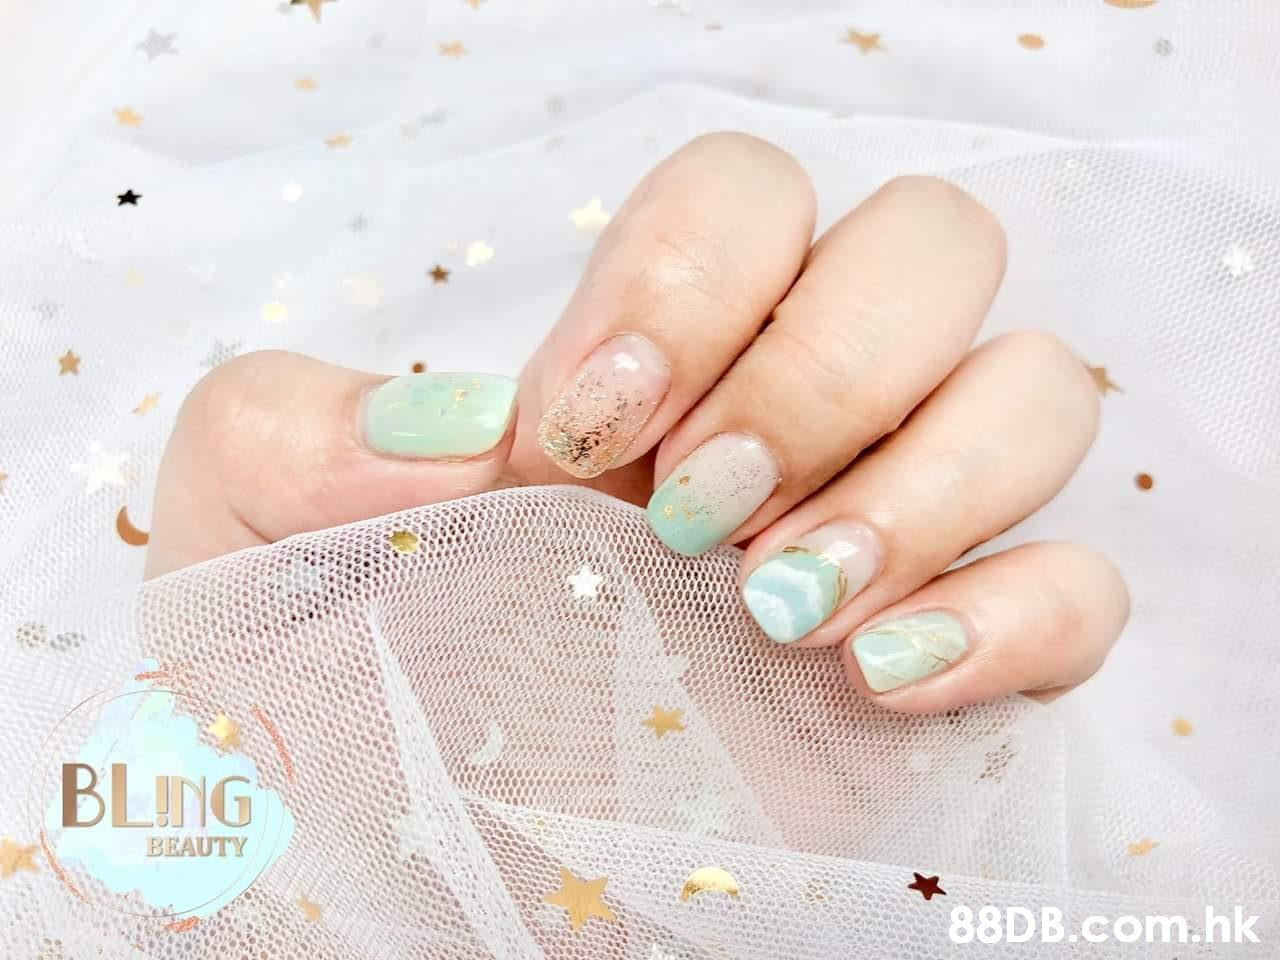 BLING BEAUTY .hk  Nail,Nail polish,Manicure,Nail care,Finger